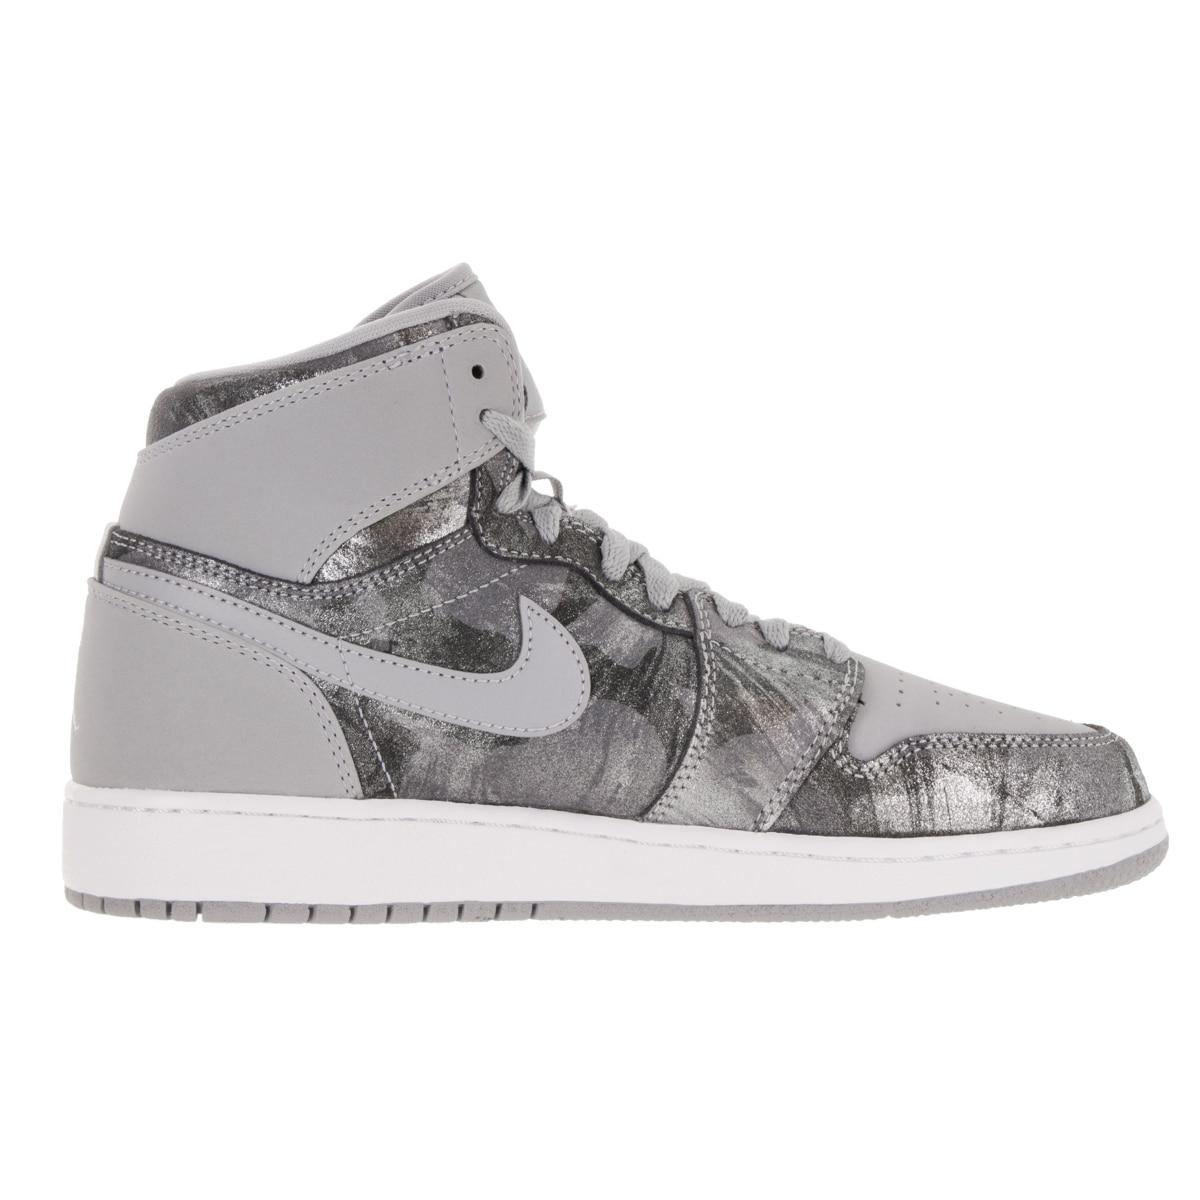 official photos a863b 4bc15 Shop Nike Jordan Kid s Air Jordan 1 Retro Hi Prem Gg Wolf Grey Metallic  Silver White Basketball Shoe - Free Shipping Today - Overstock - 12322372